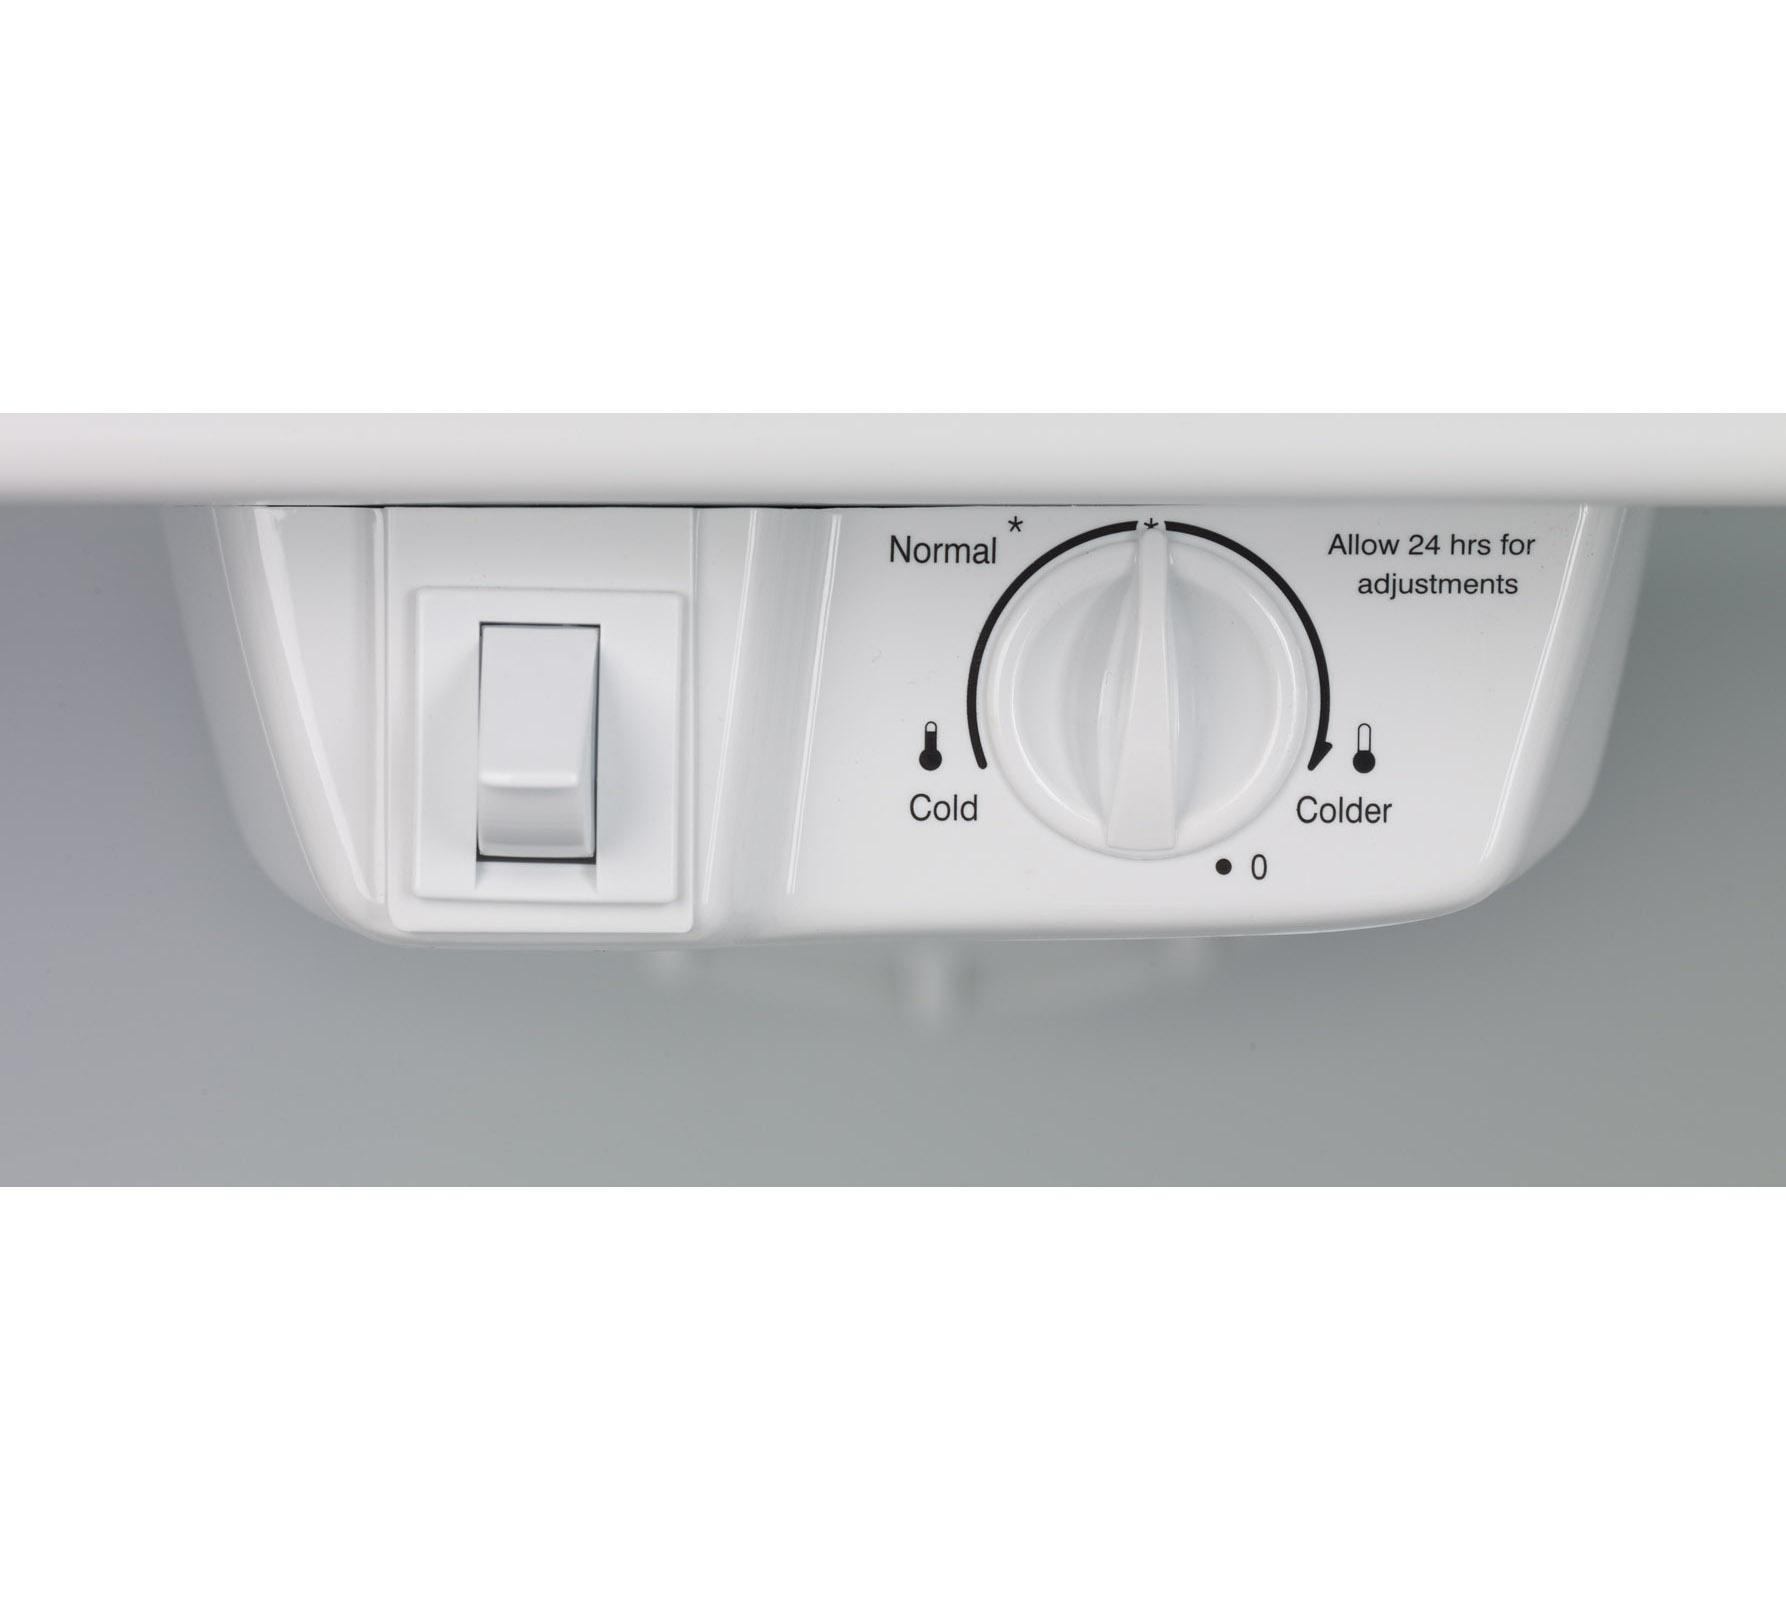 Frigidaire FFHT1514QW 14.5 cu. ft. Top-Mount Refrigerator - White